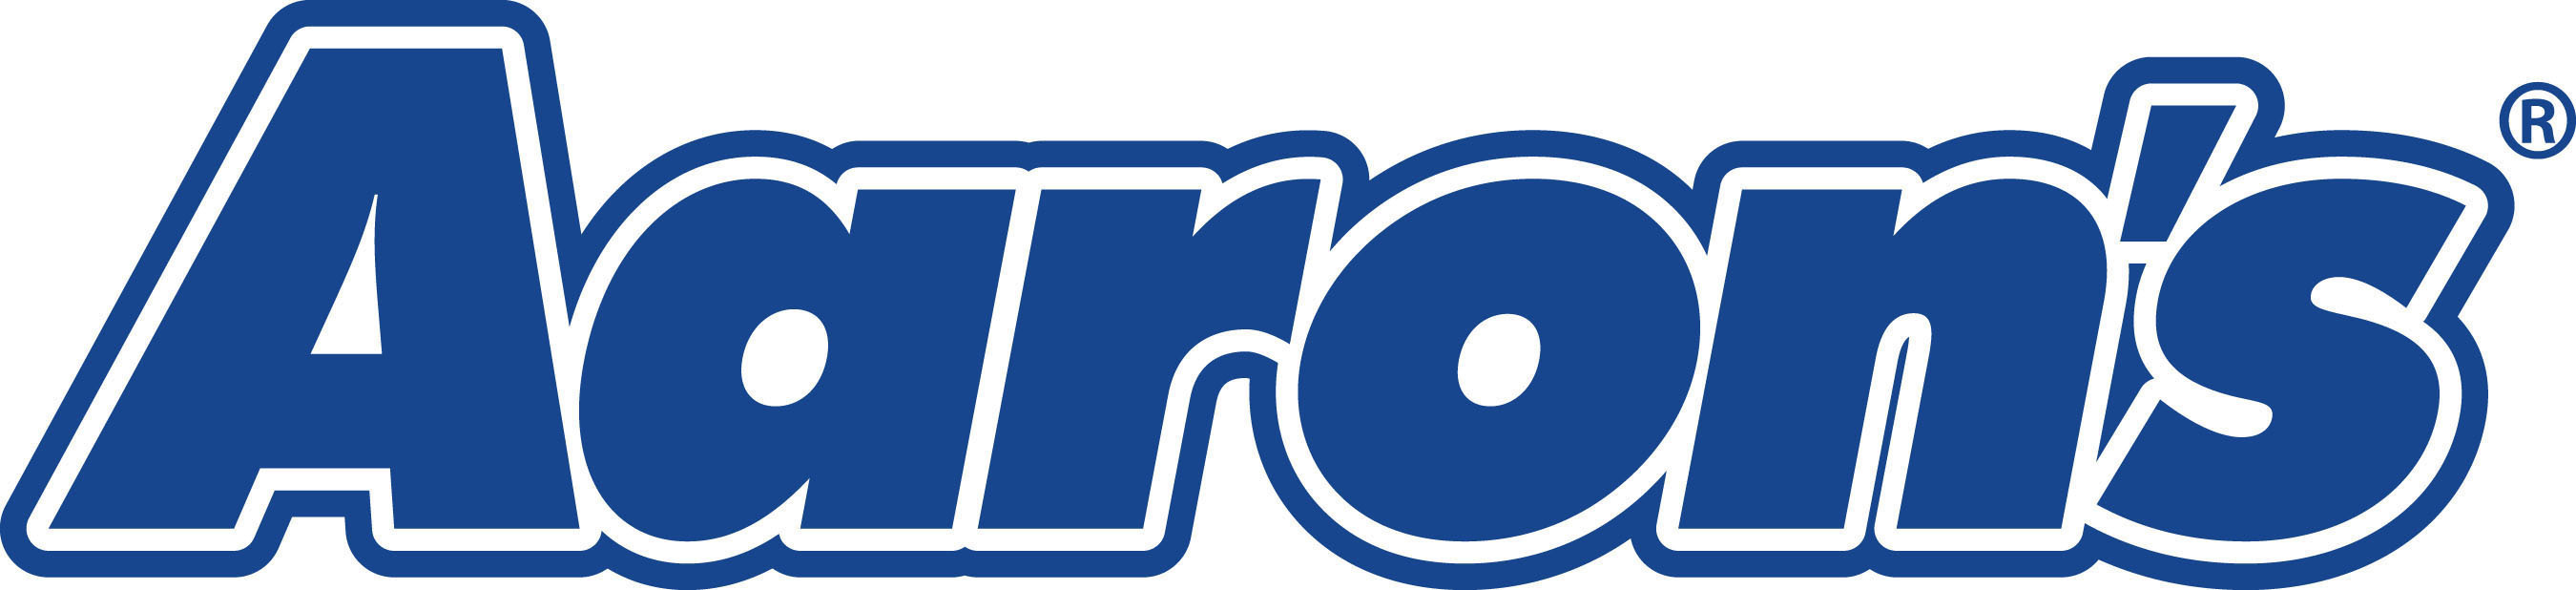 Aaron's logo.